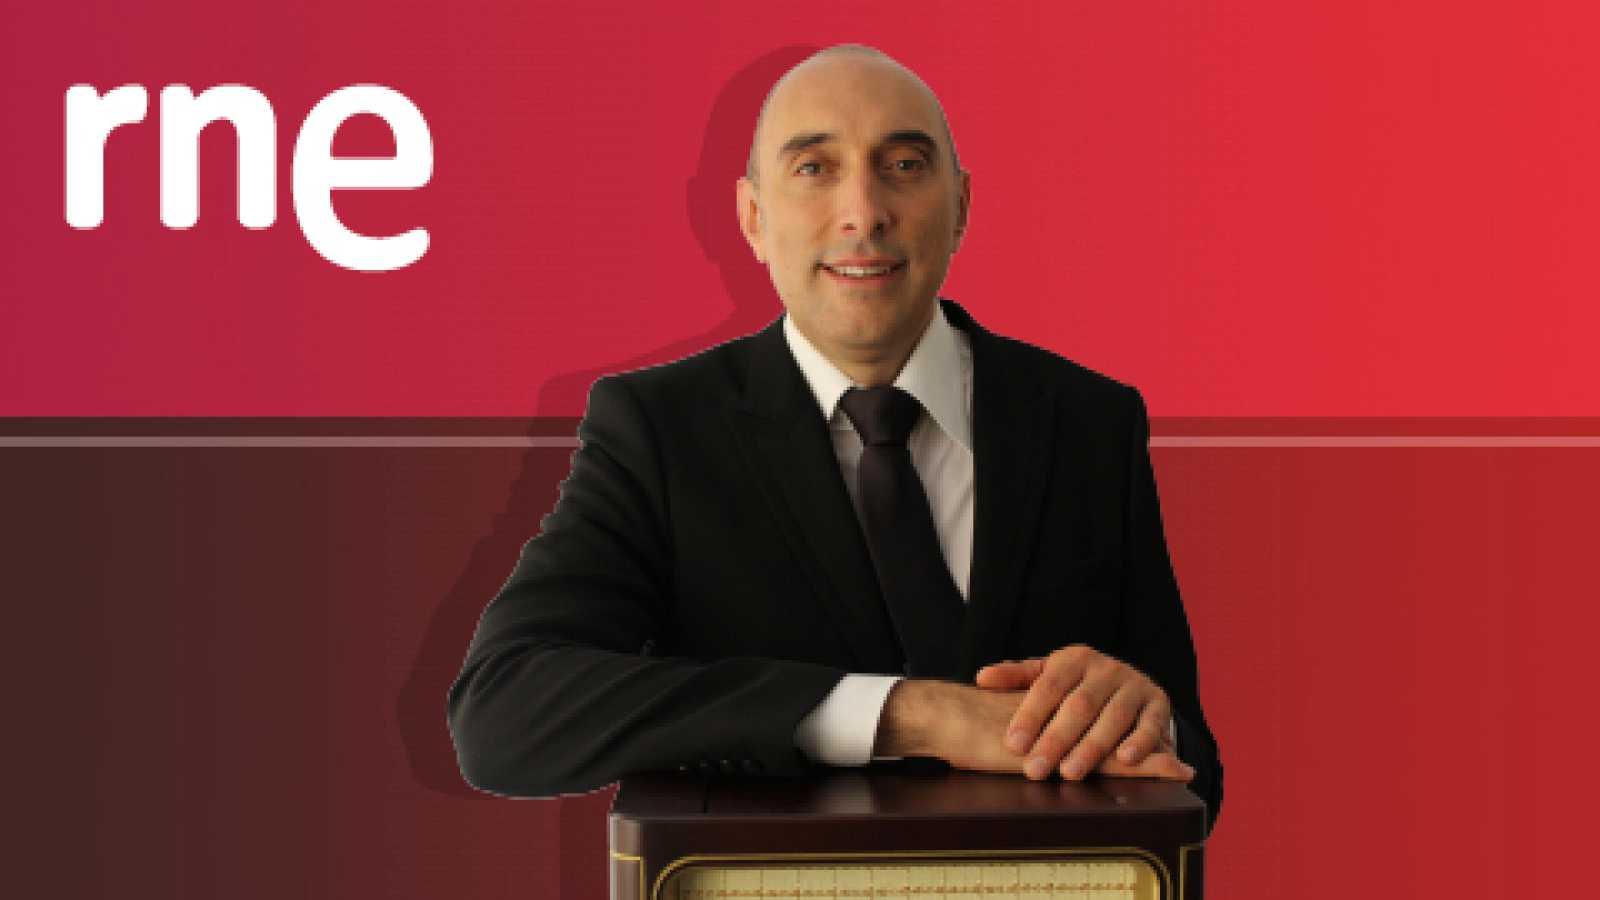 Entrevista a ALEJANDRO KRAWIETZ, director insular de cultura del Cabildo de Tenerife - Escuchar ahora